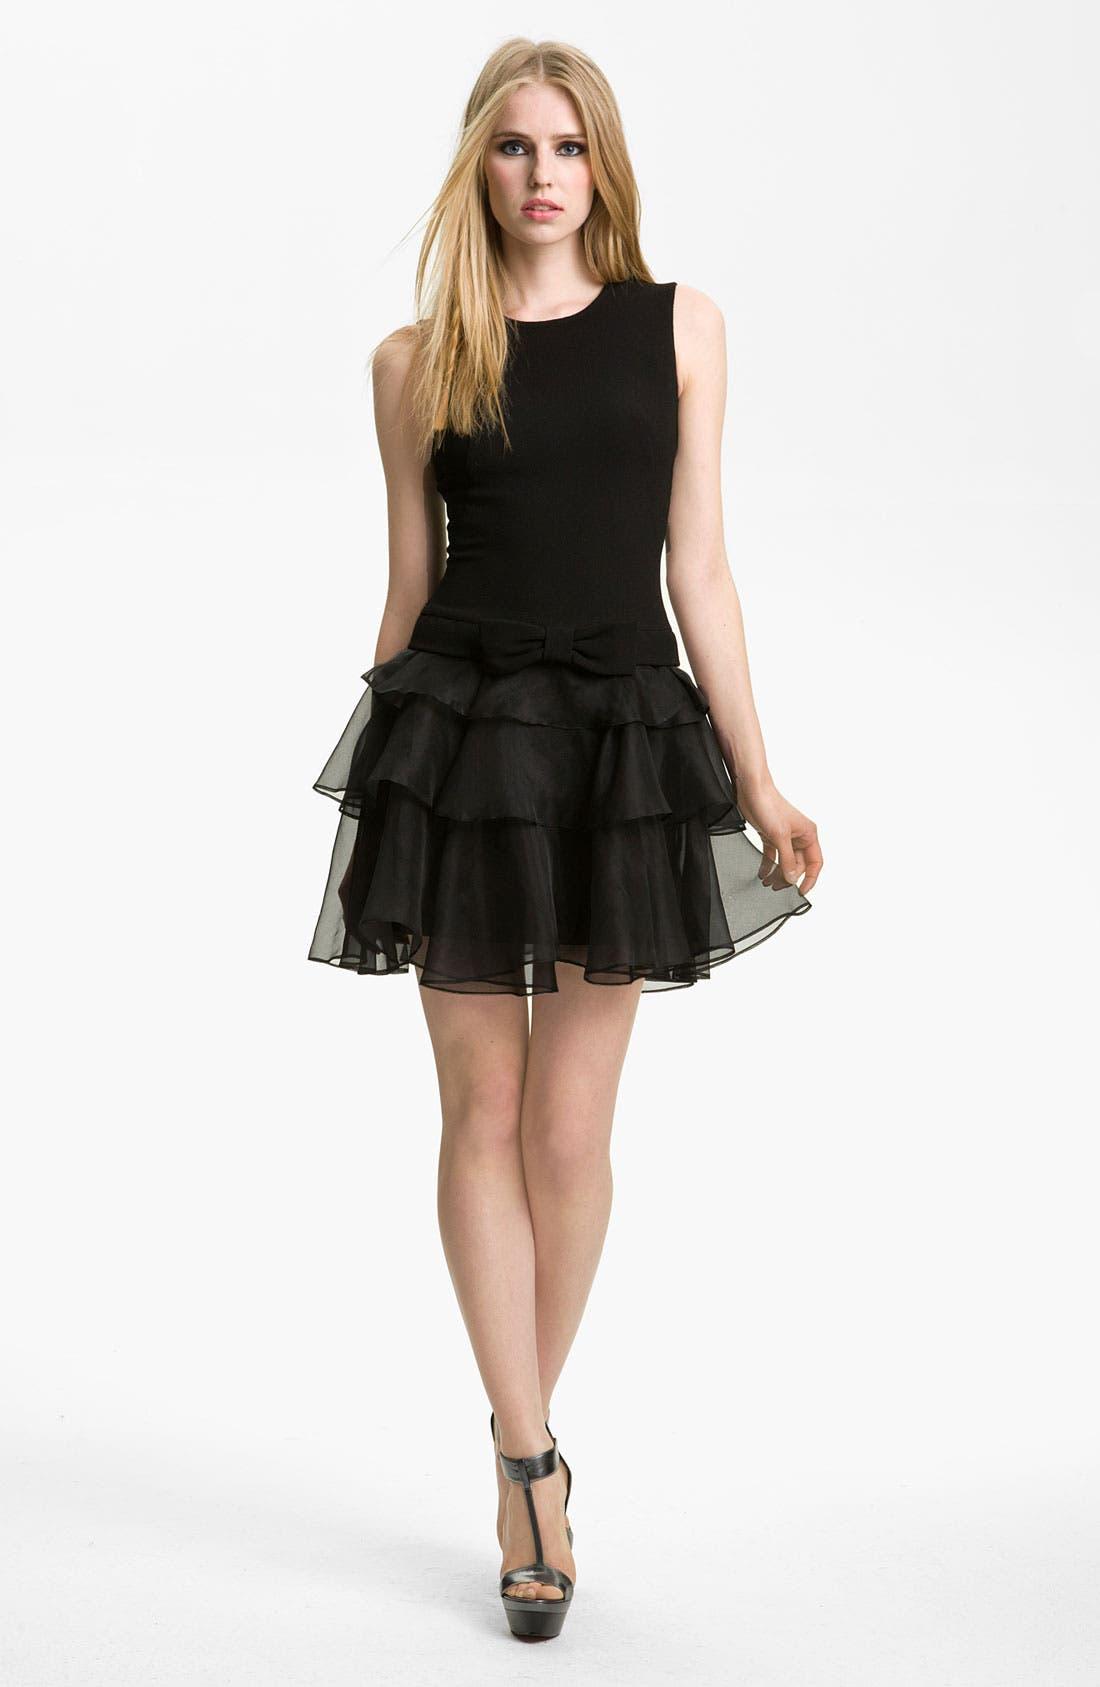 Alternate Image 1 Selected - Rachel Zoe 'Judi' Ruffled Crepe Dress